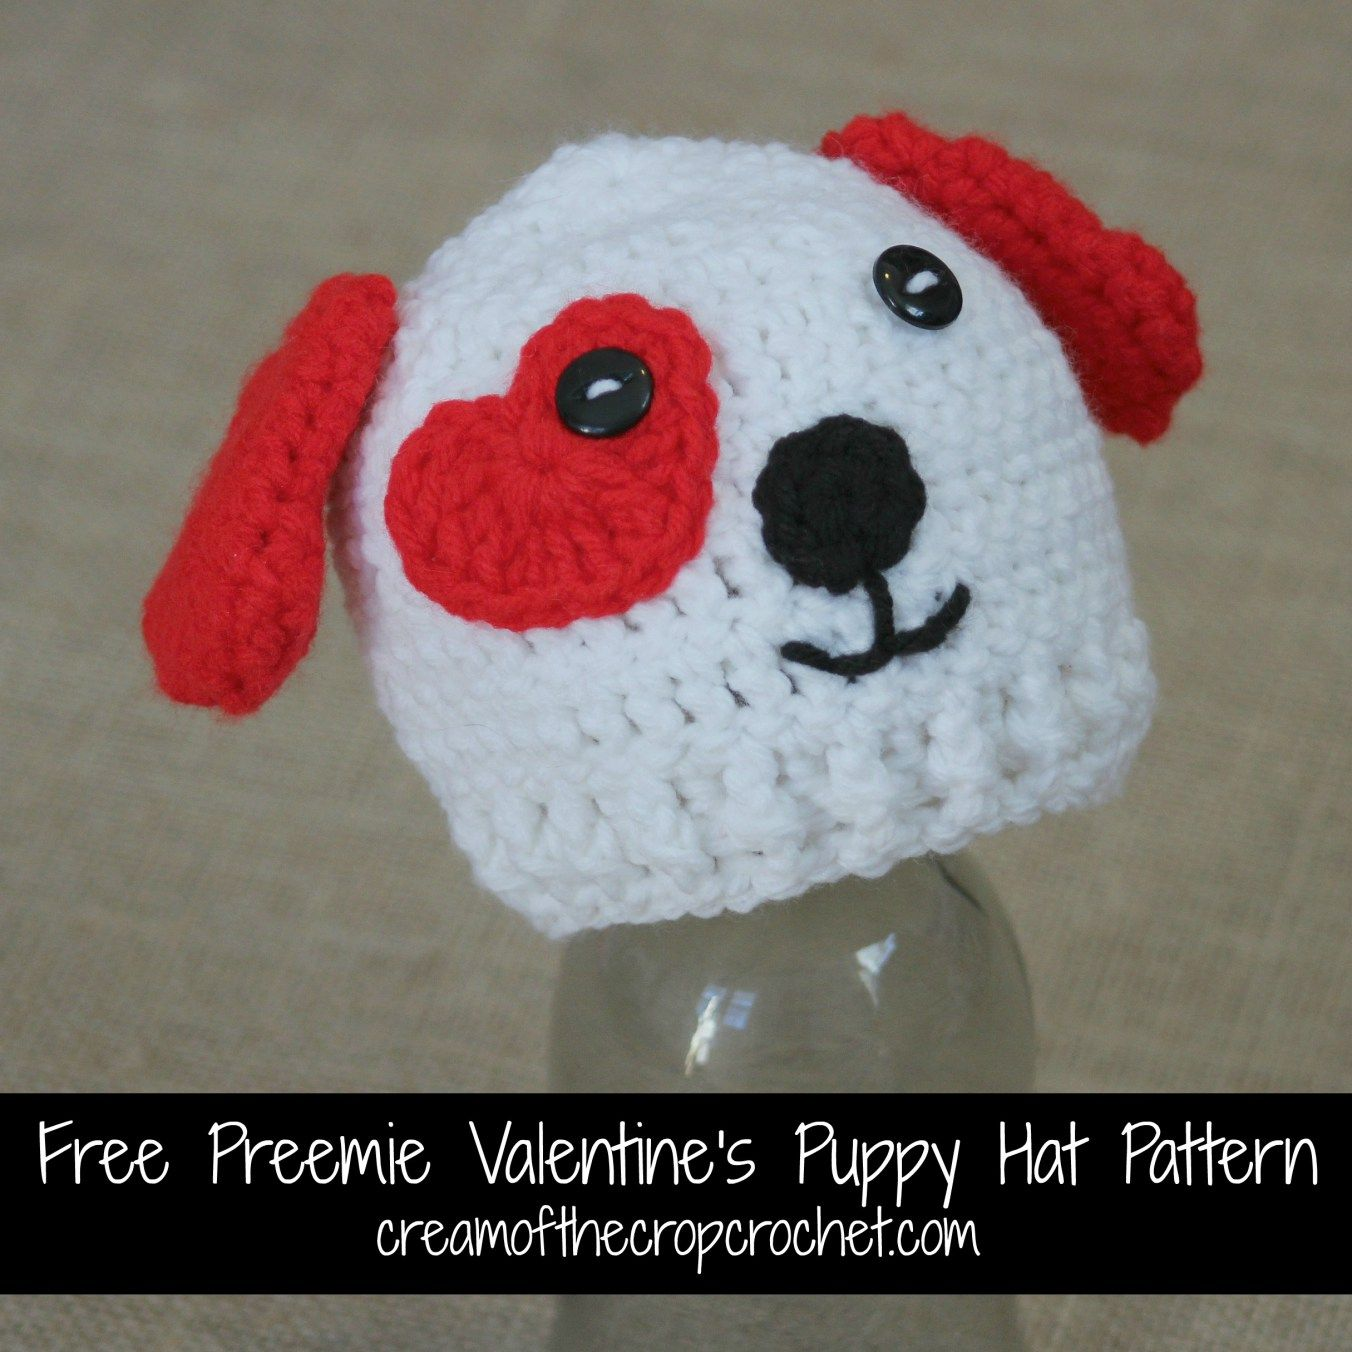 Cream of the crop crochet preemie valentines puppy hat free cream of the crop crochet preemie valentines puppy hat free crochet pattern bankloansurffo Gallery